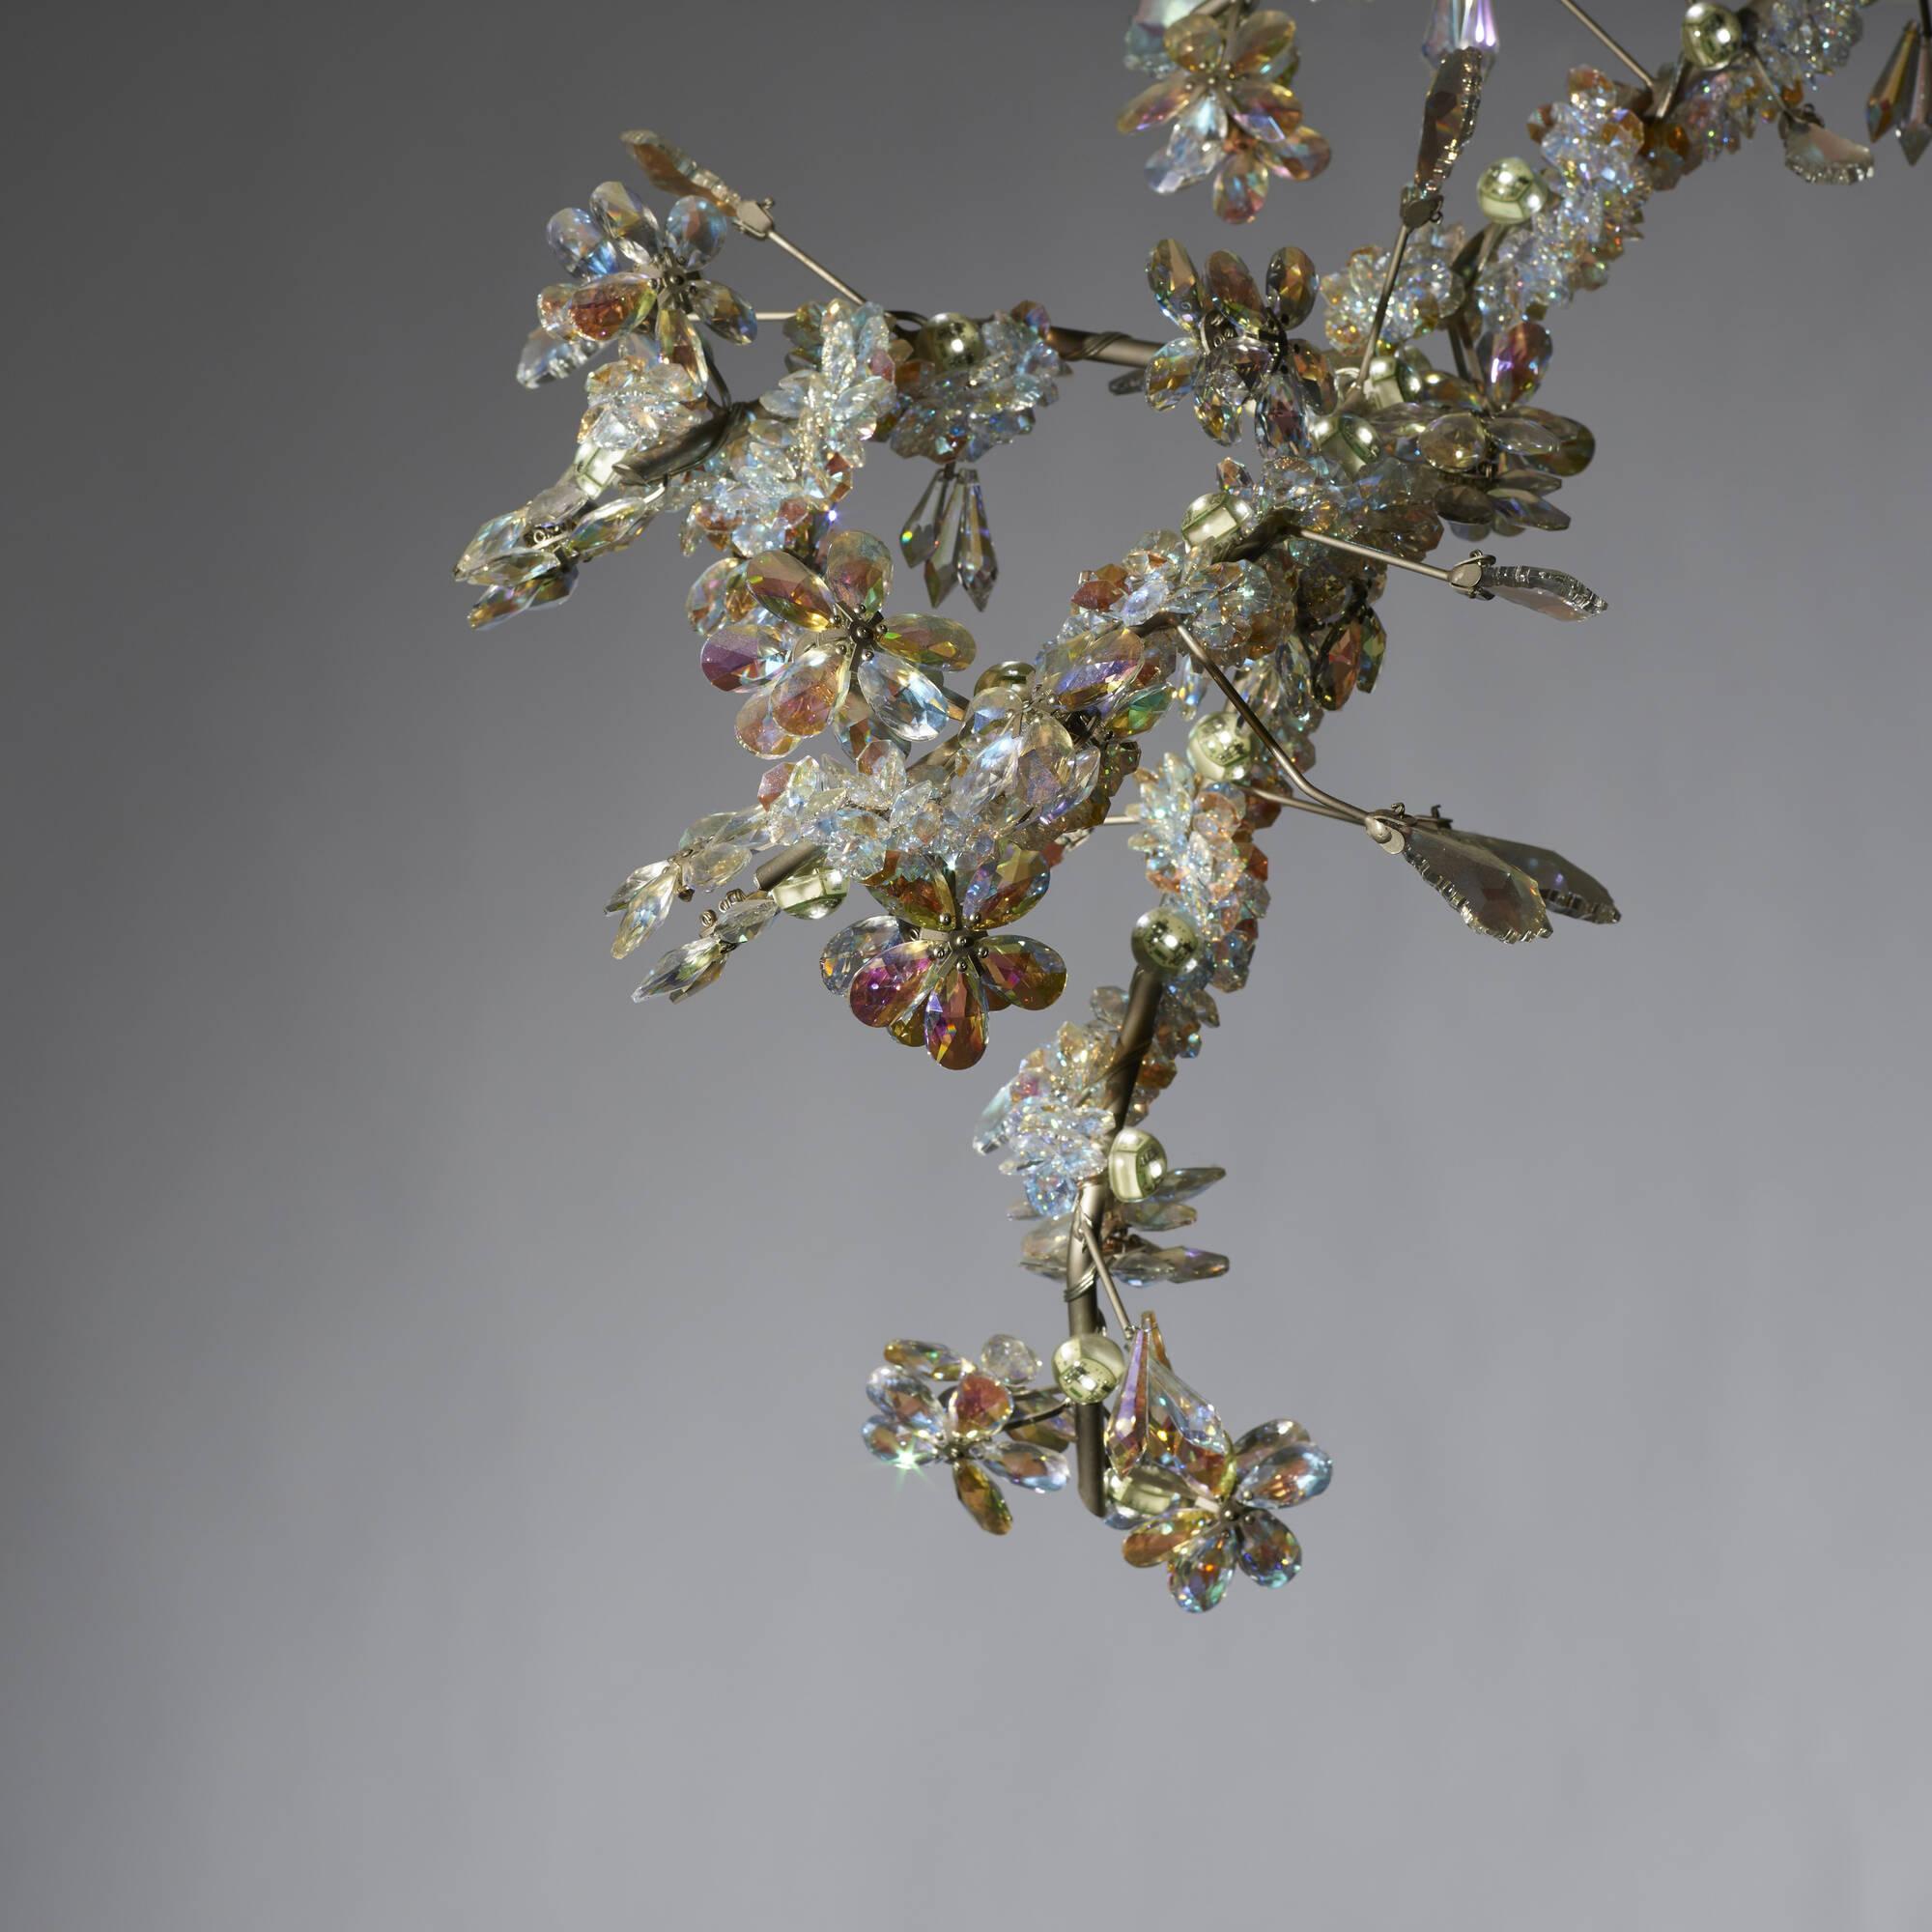 tord boontje  blossom chandelier  design  march   -   tord boontje  blossom chandelier ( of )